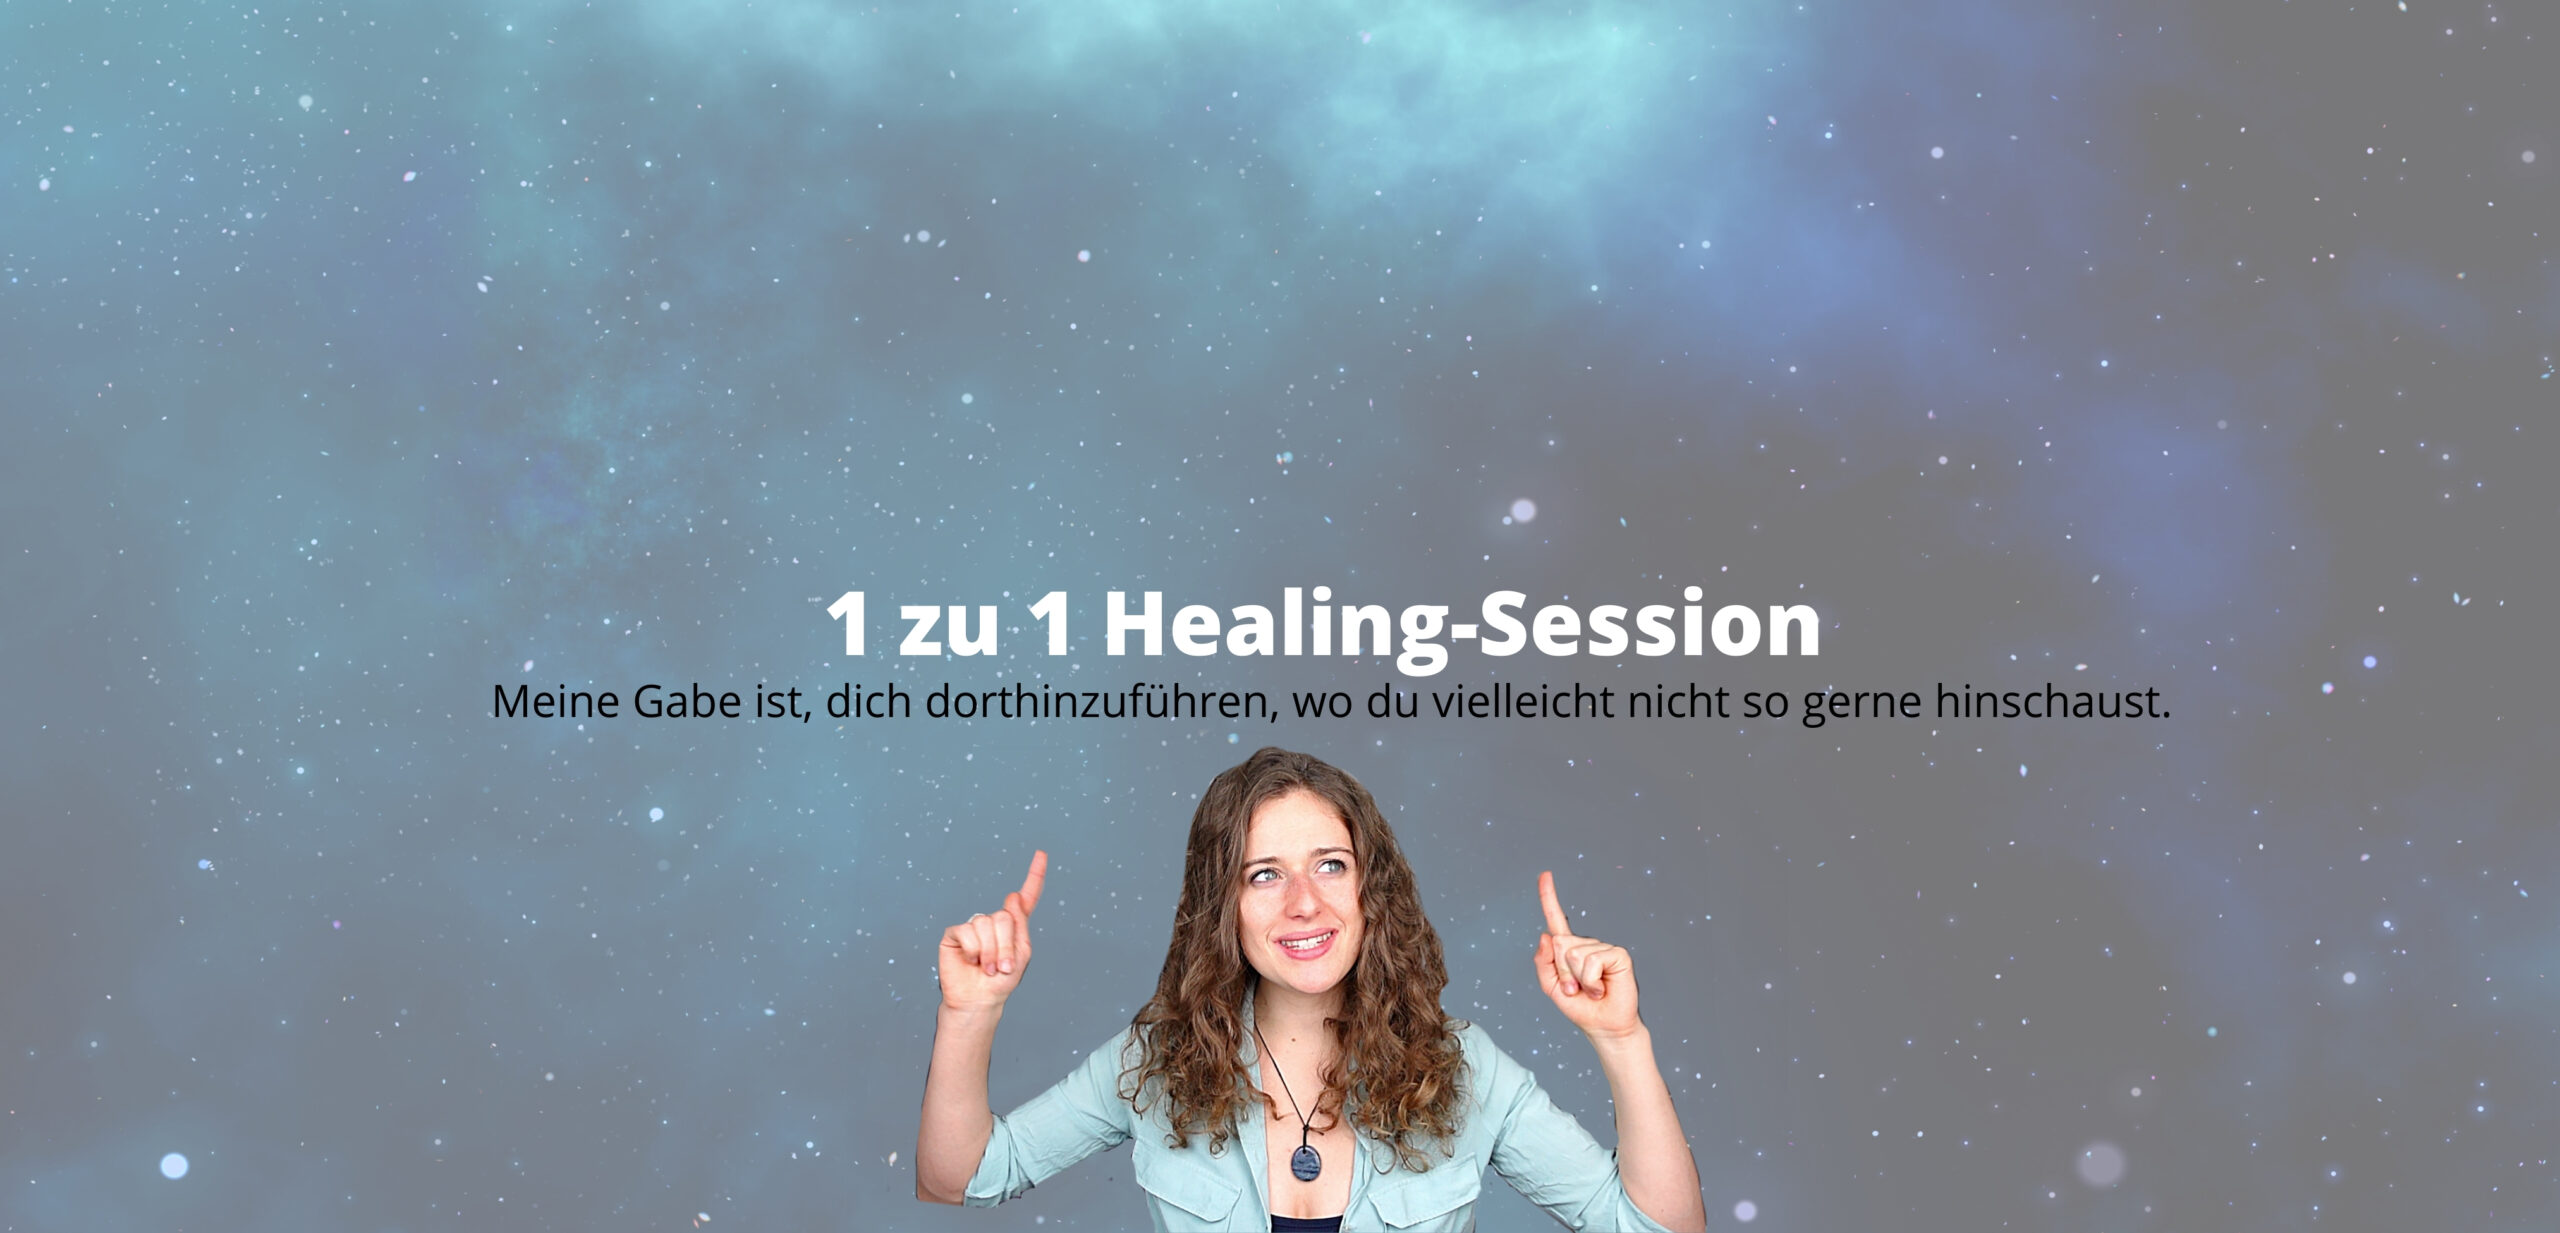 1 zu 1 Healing-Session